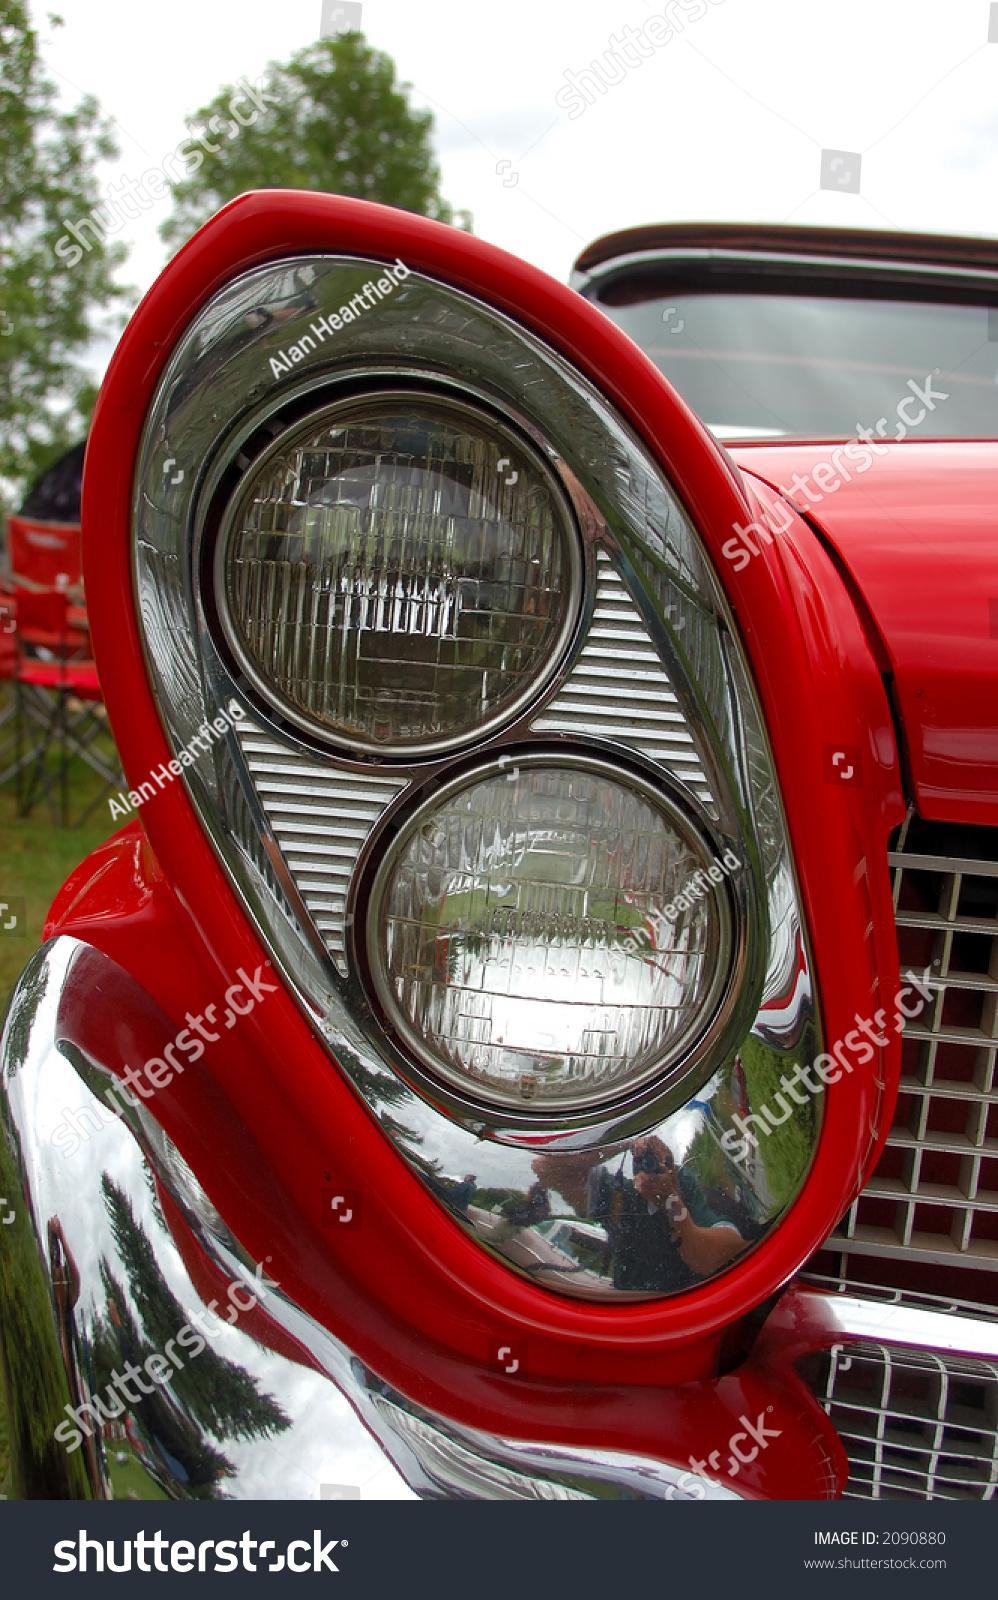 Antique Automobile Headlamps : Vintage car headlight stock photo  shutterstock